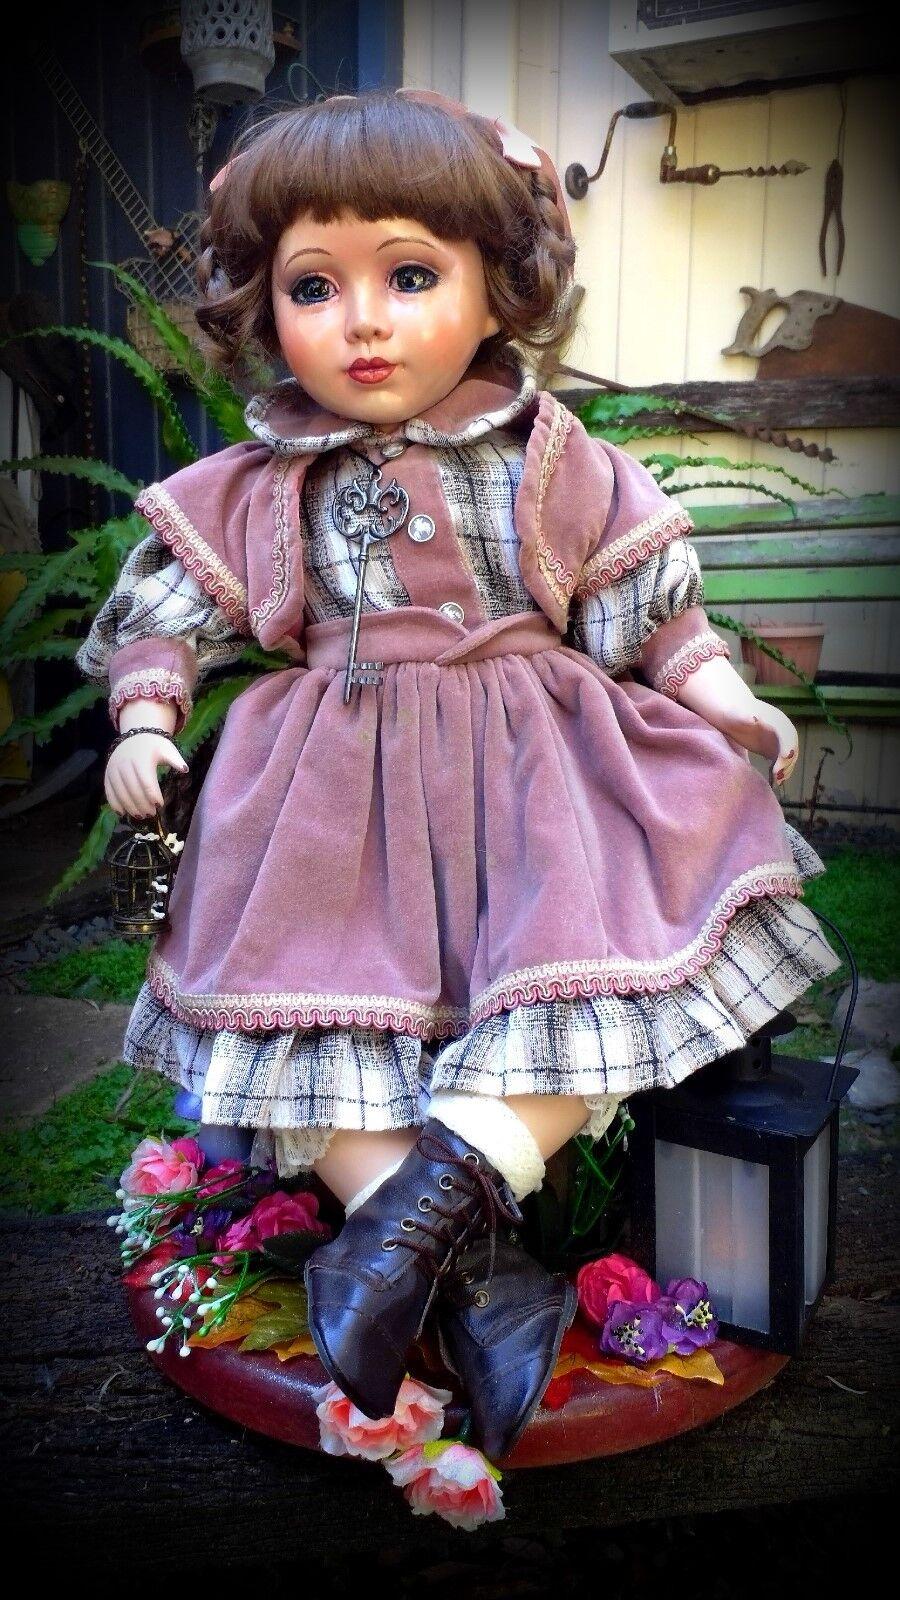 OOAK Porcelain Doll Faery Hunter Giselle fairy display